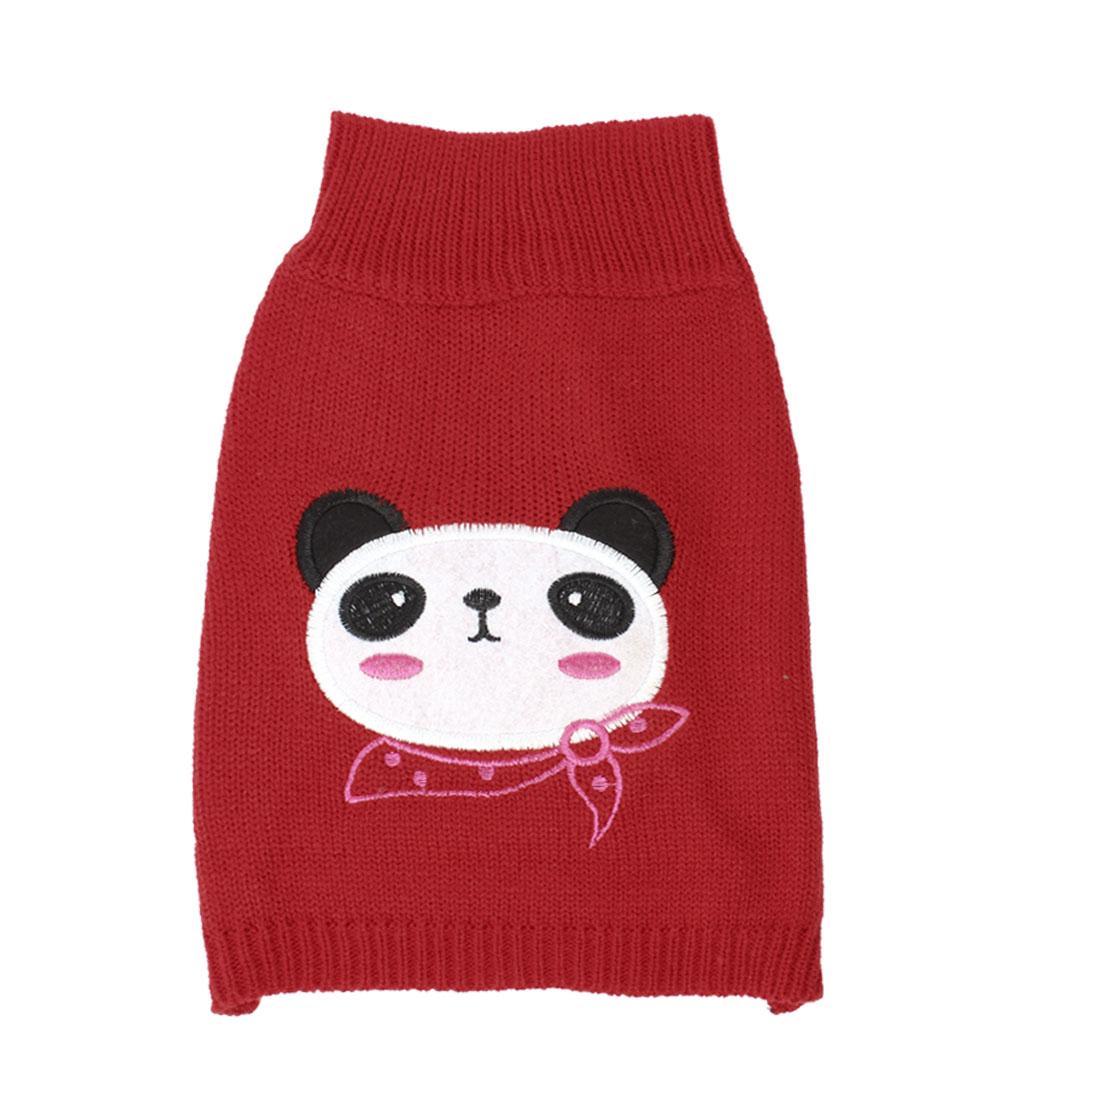 Winter Ribbed Hem Panda Print Pet Dog Yorkie Knitwear Sweater Red M